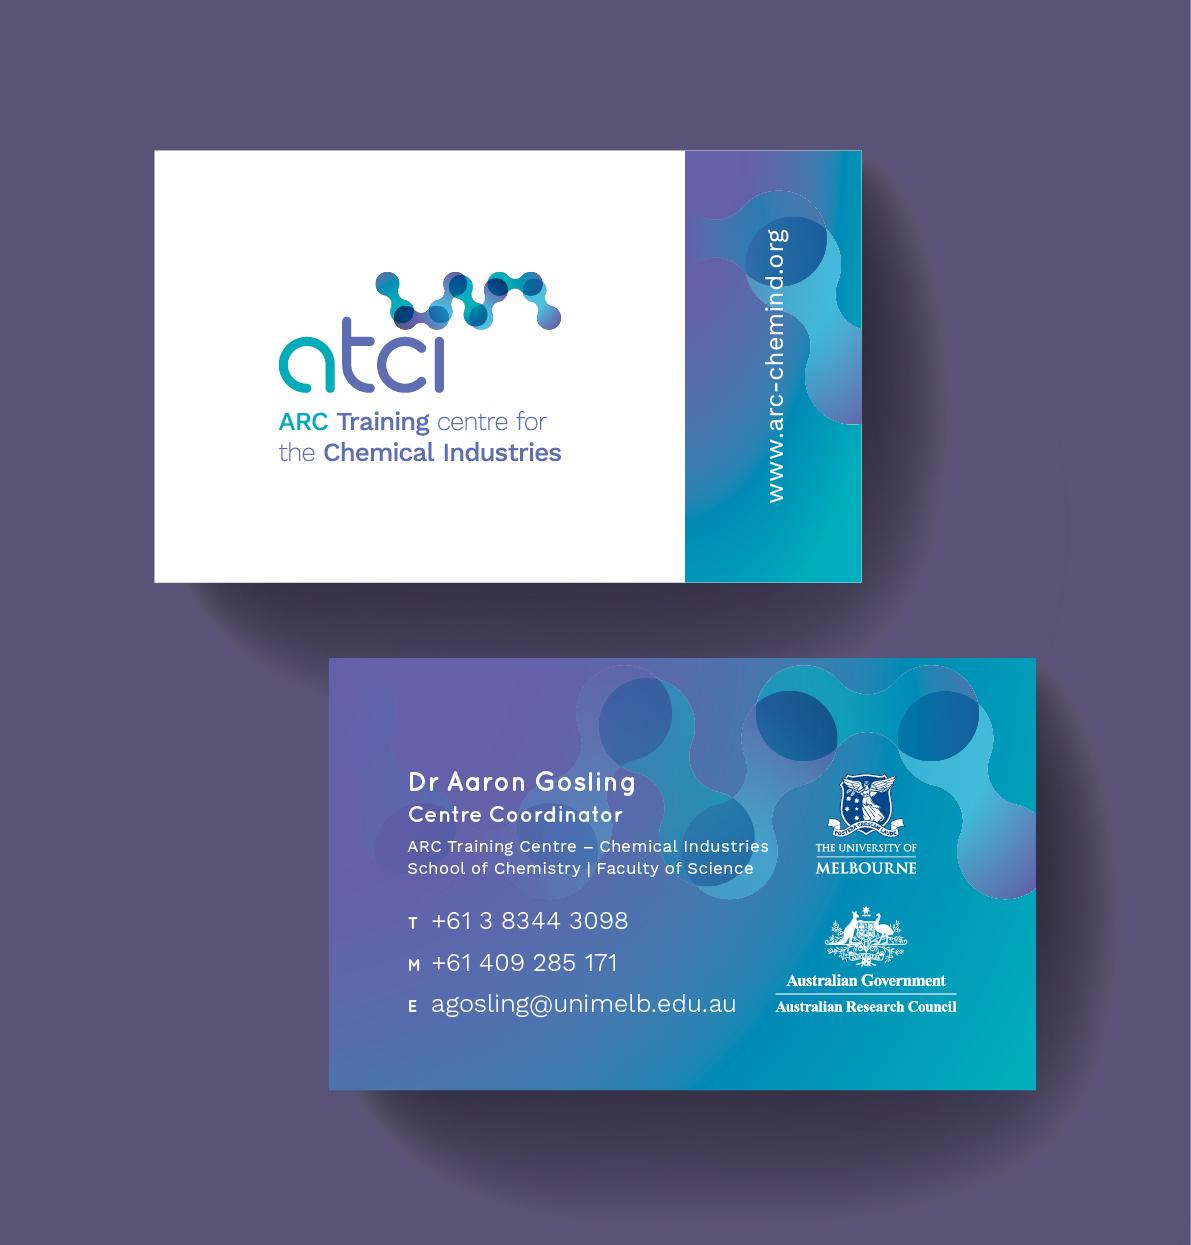 tout-creative-university-of-melbourne-business-card.jpg